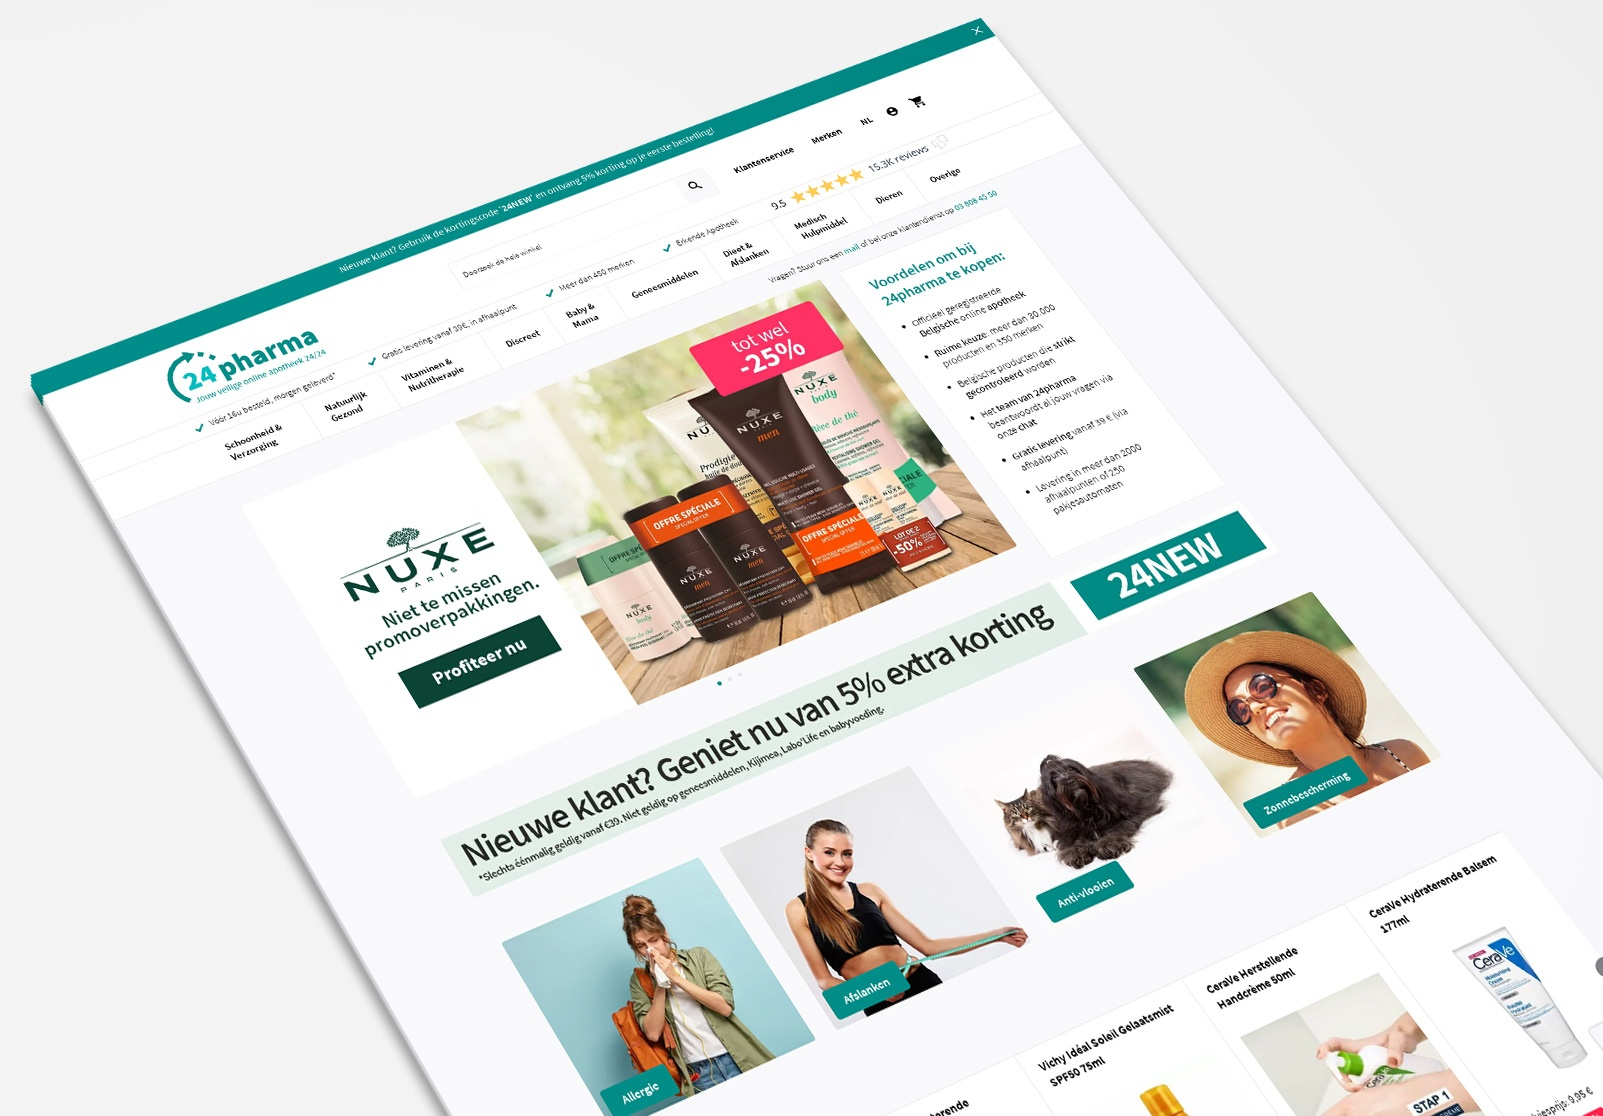 pharmacy webshop 24pharma